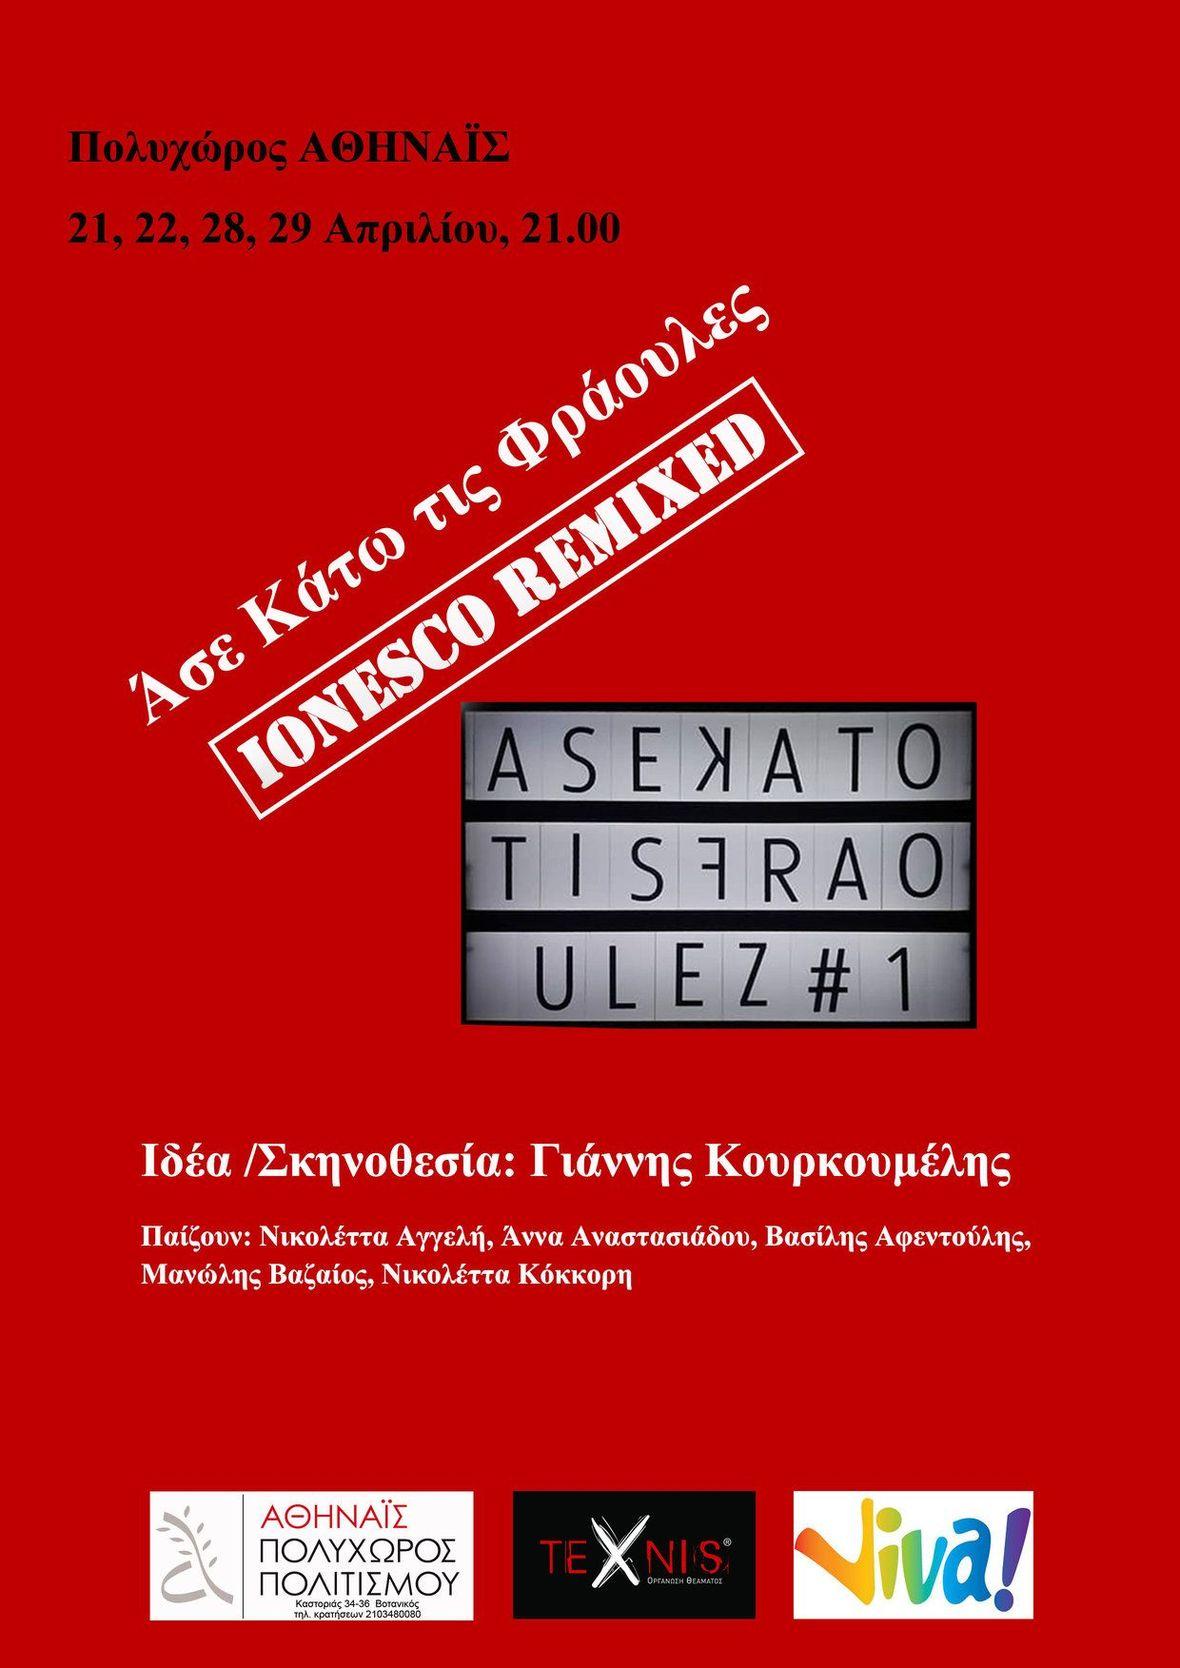 rsz poster 9